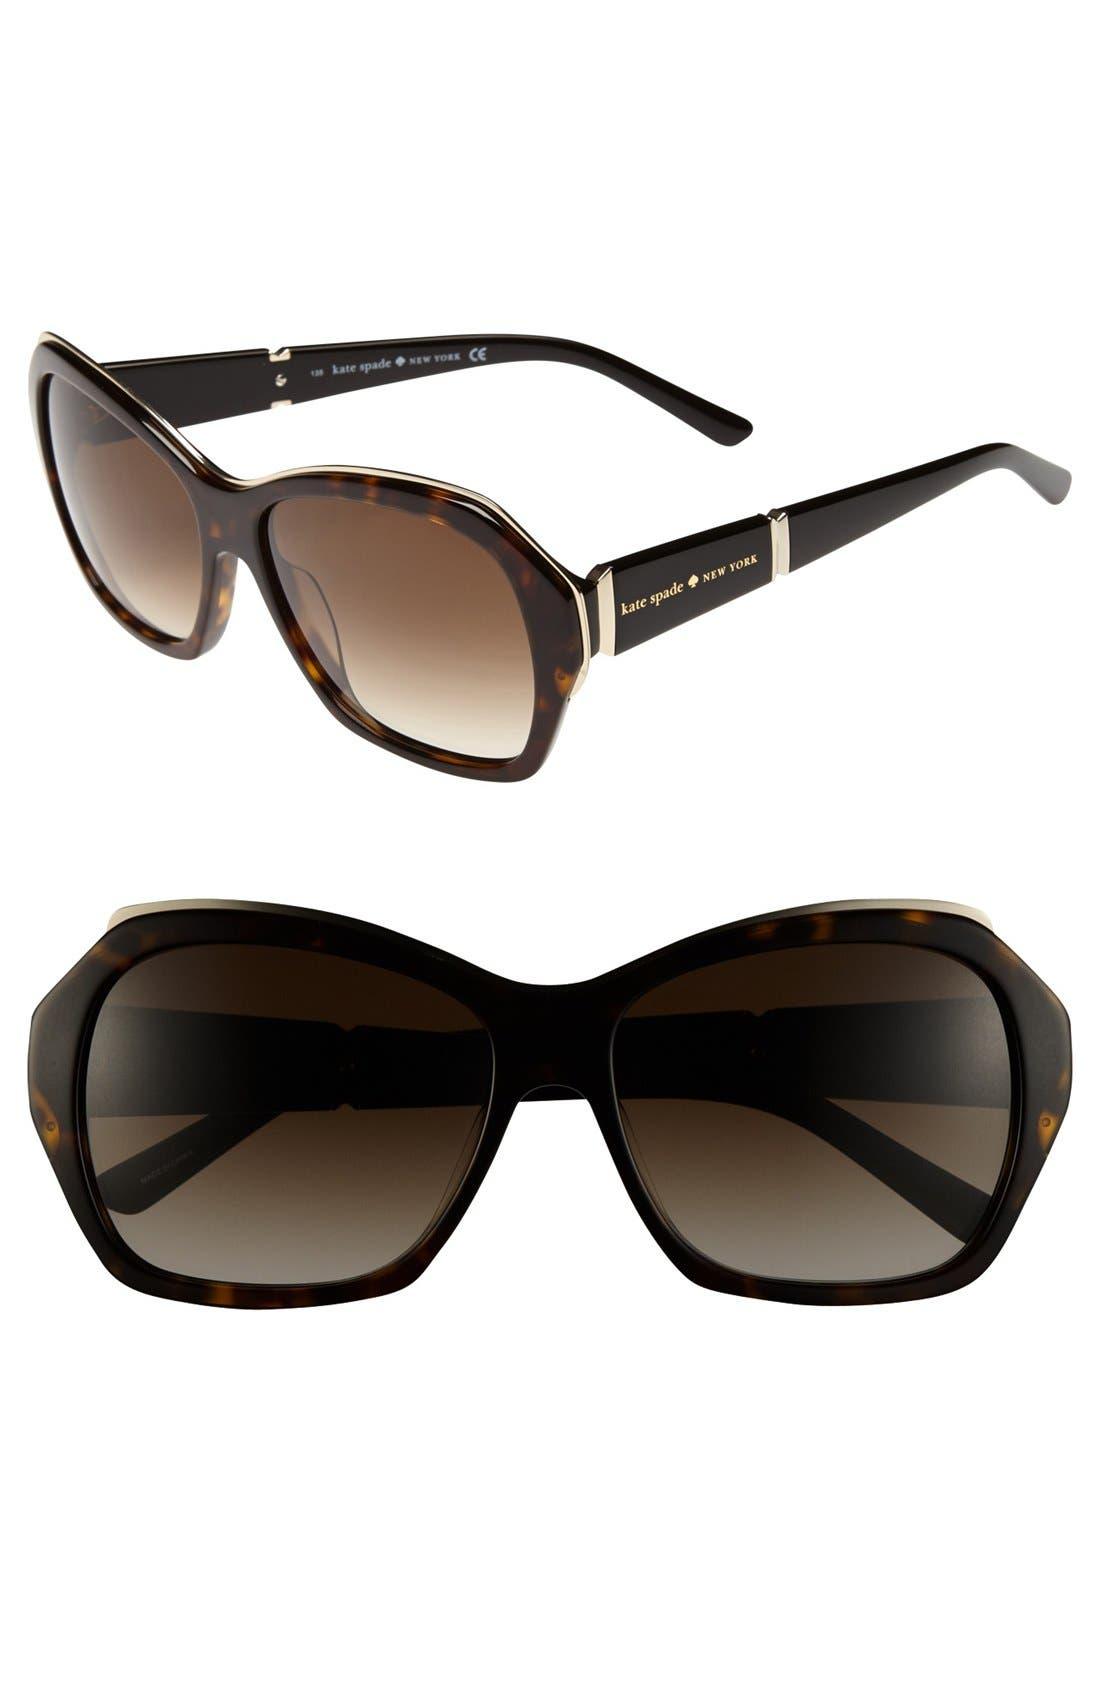 Main Image - kate spade new york 'gianna' 57mm oversized sunglasses